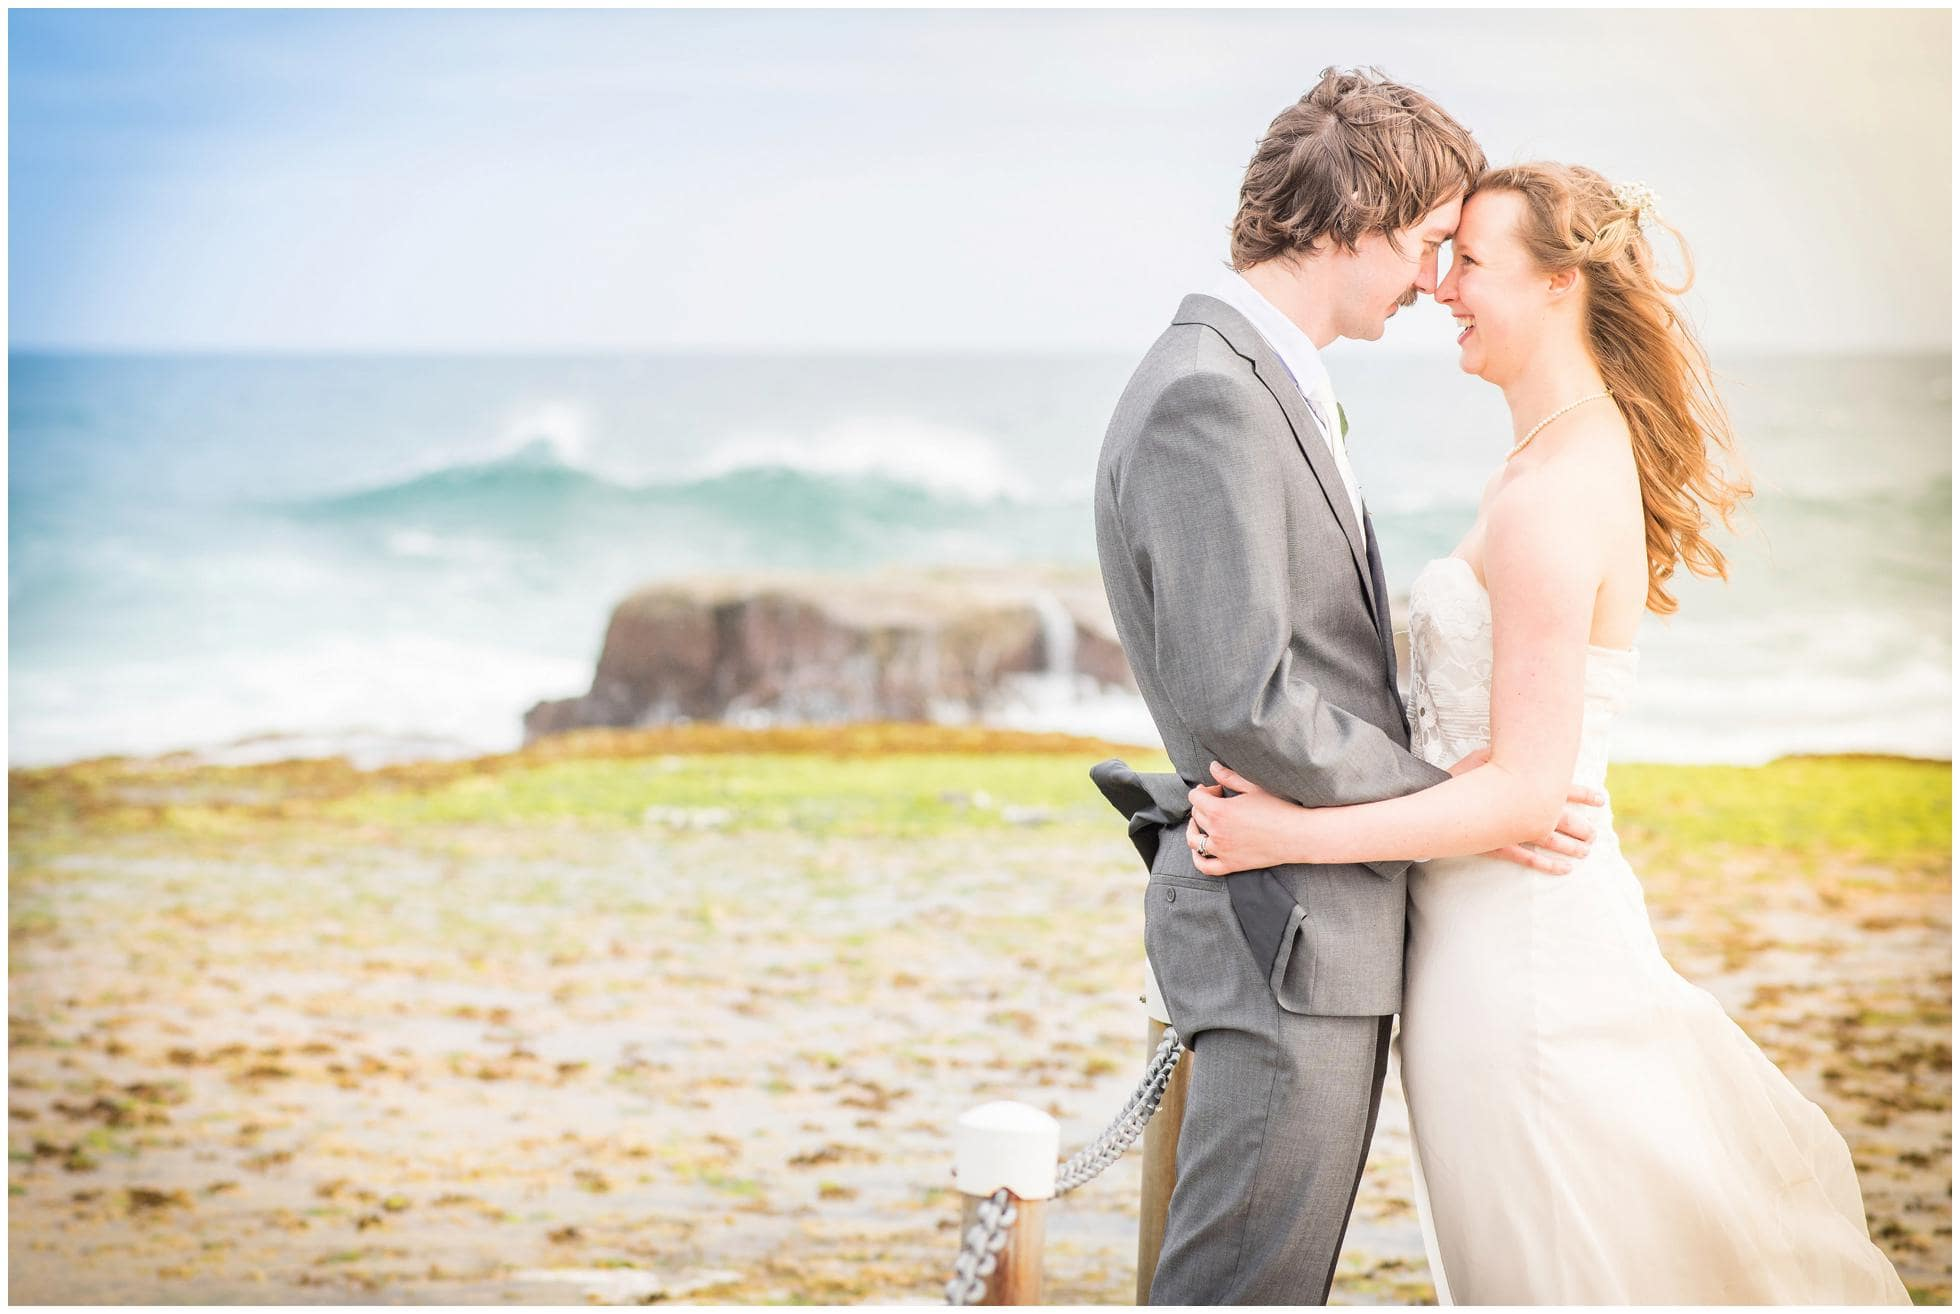 Mona Vale Wedding Photography Australia. Bride and Groom enjoying each others embrace on the rocks.